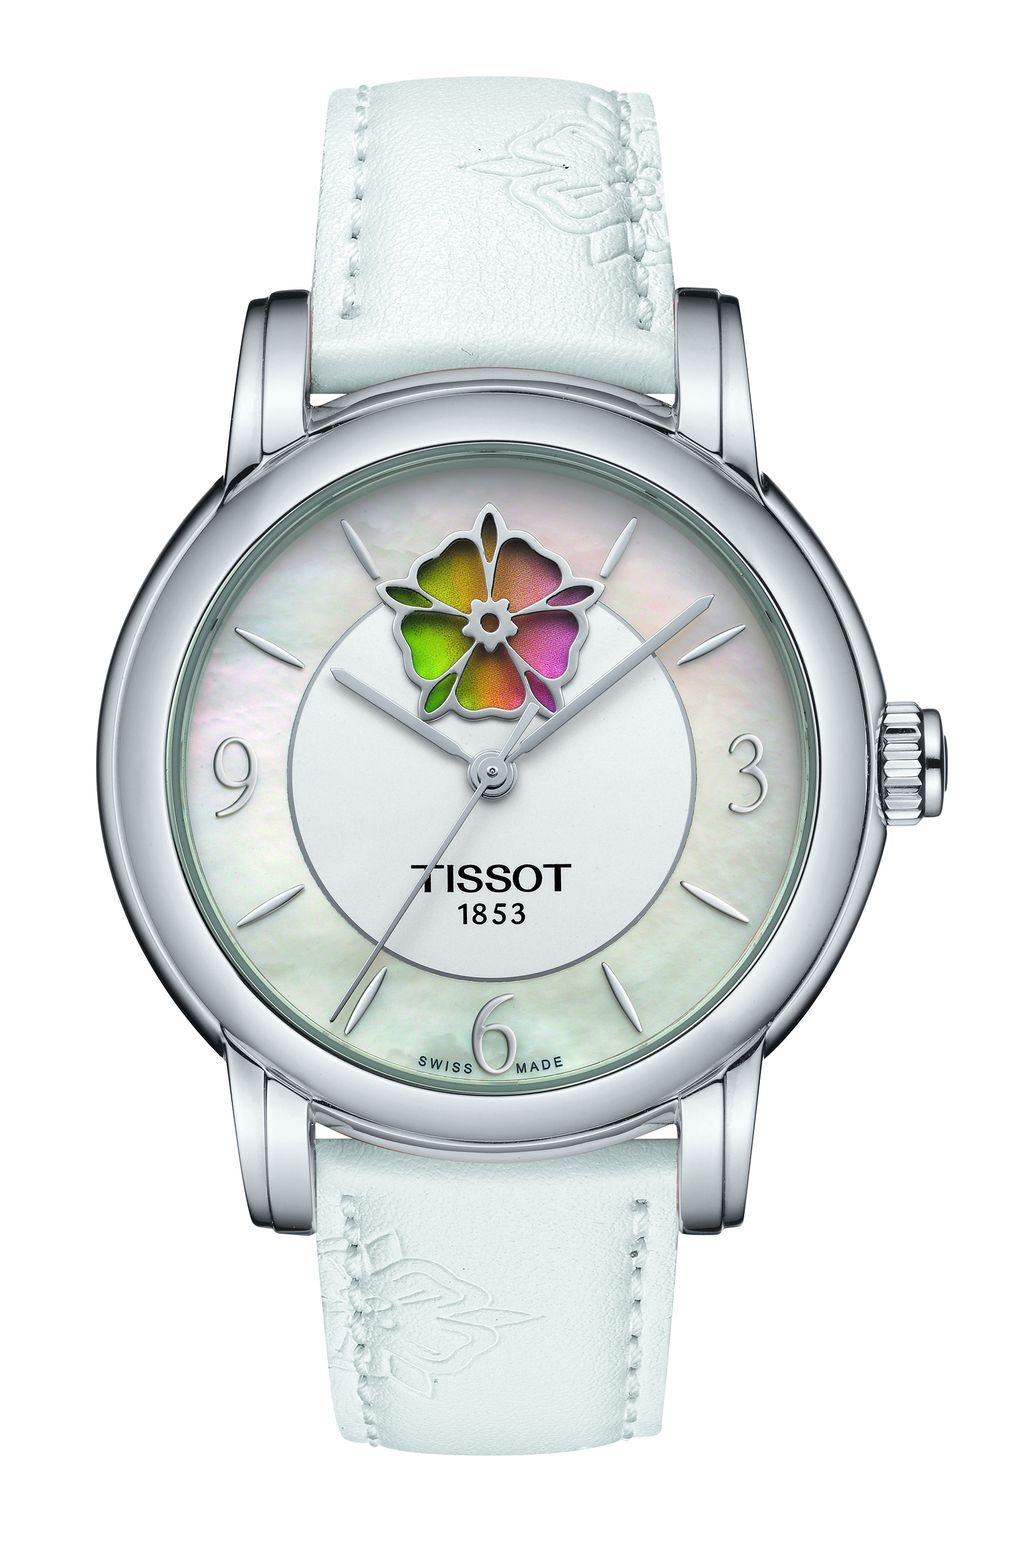 Tissot Lady Heart Automatic 開心系列女錶